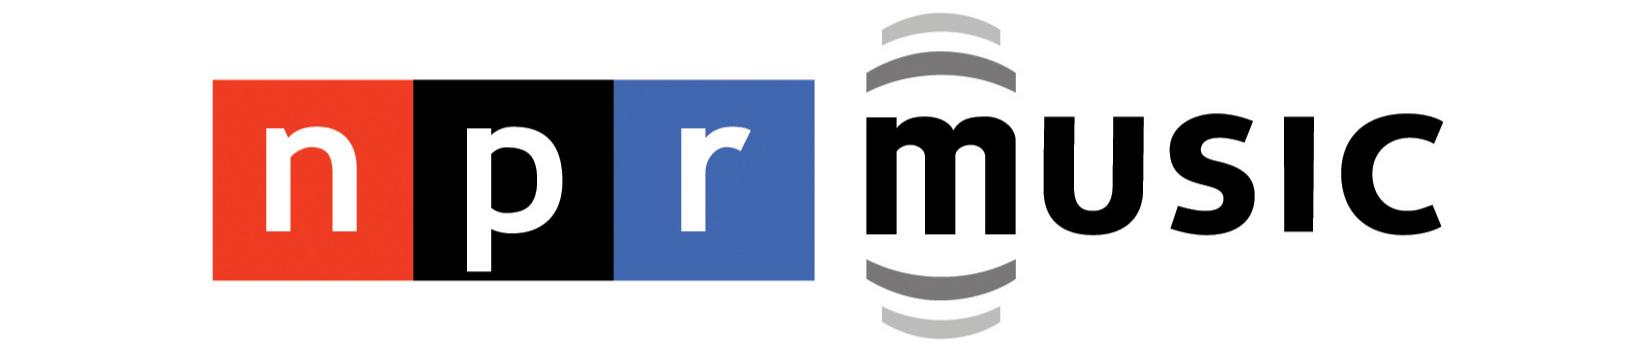 logos-white-1_0023_npr_music_rgb.jpg